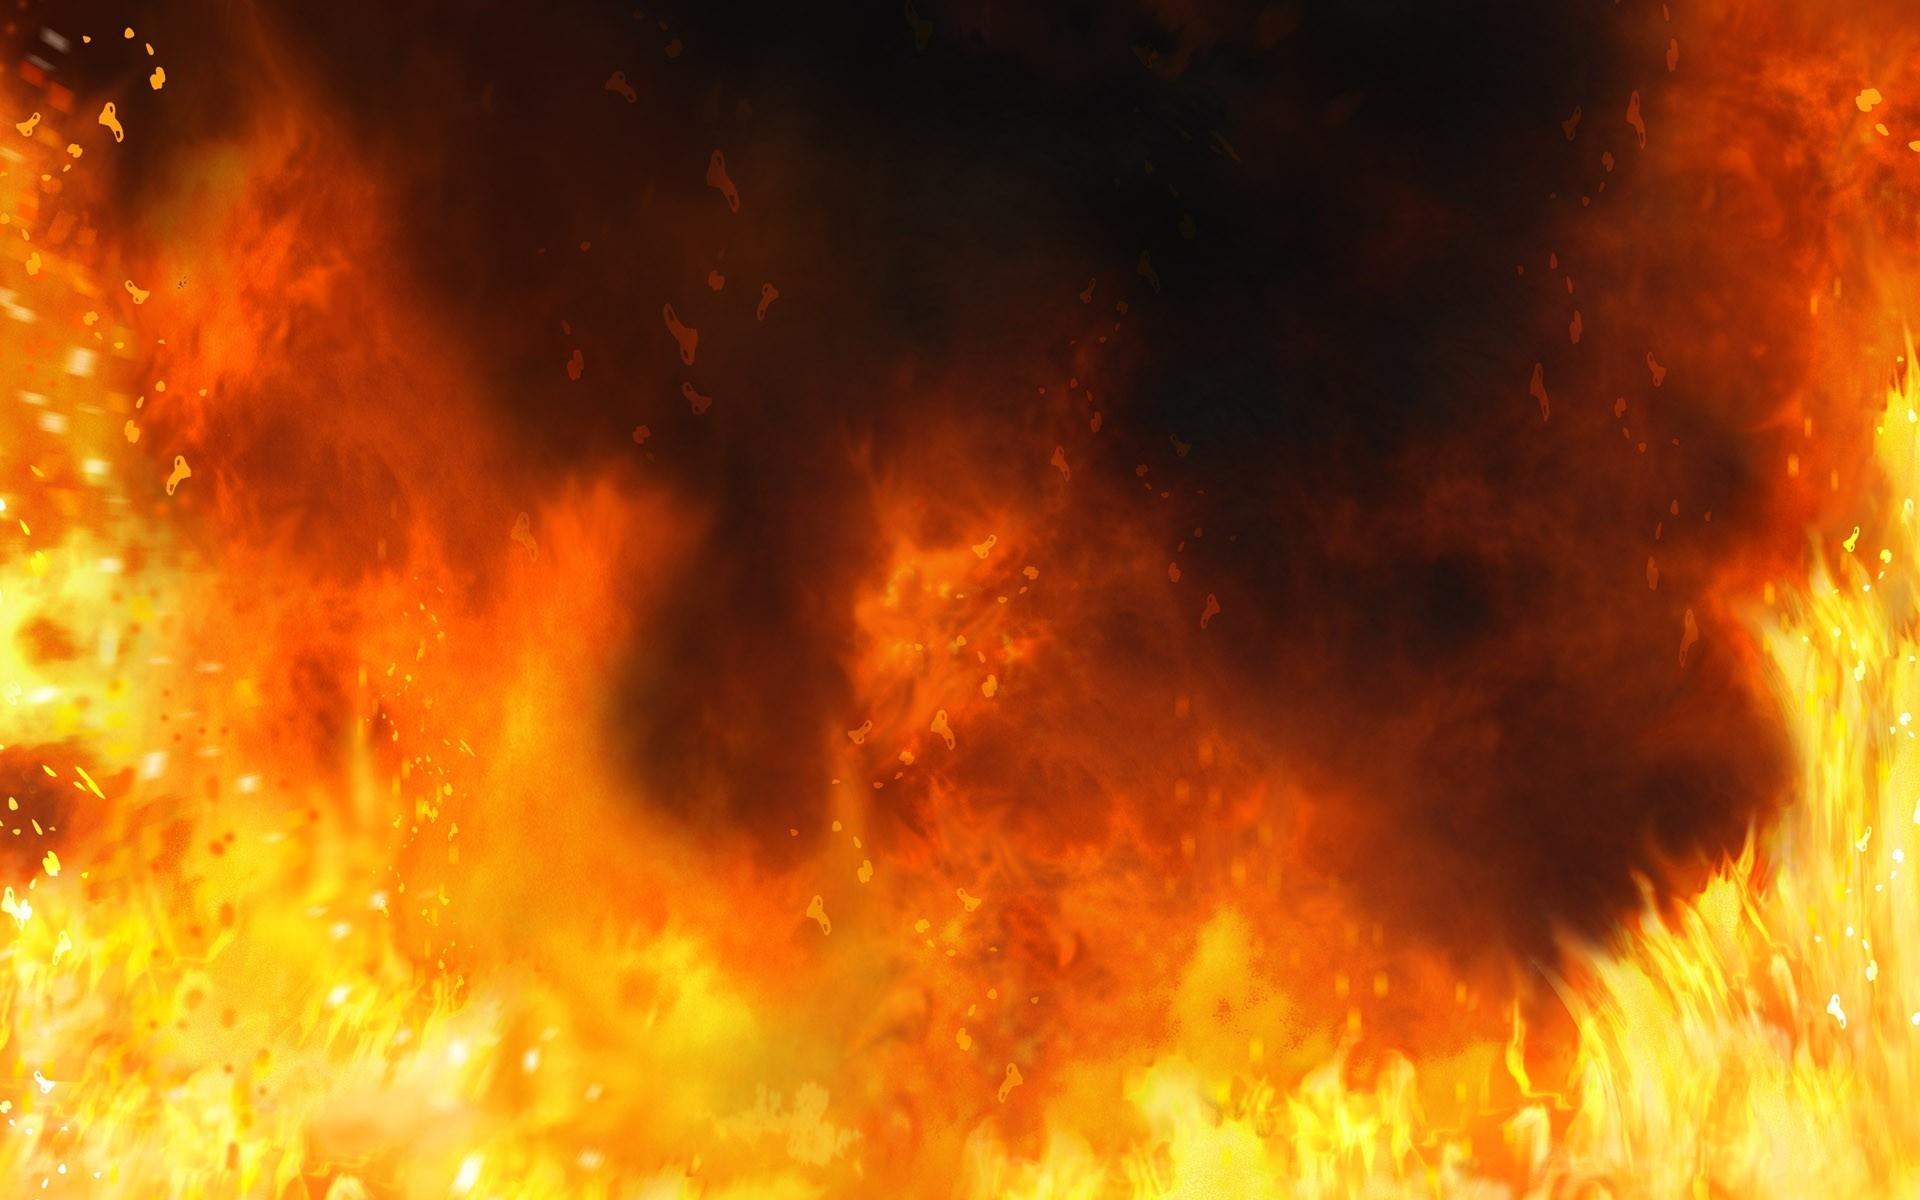 wallpaper fire background flames